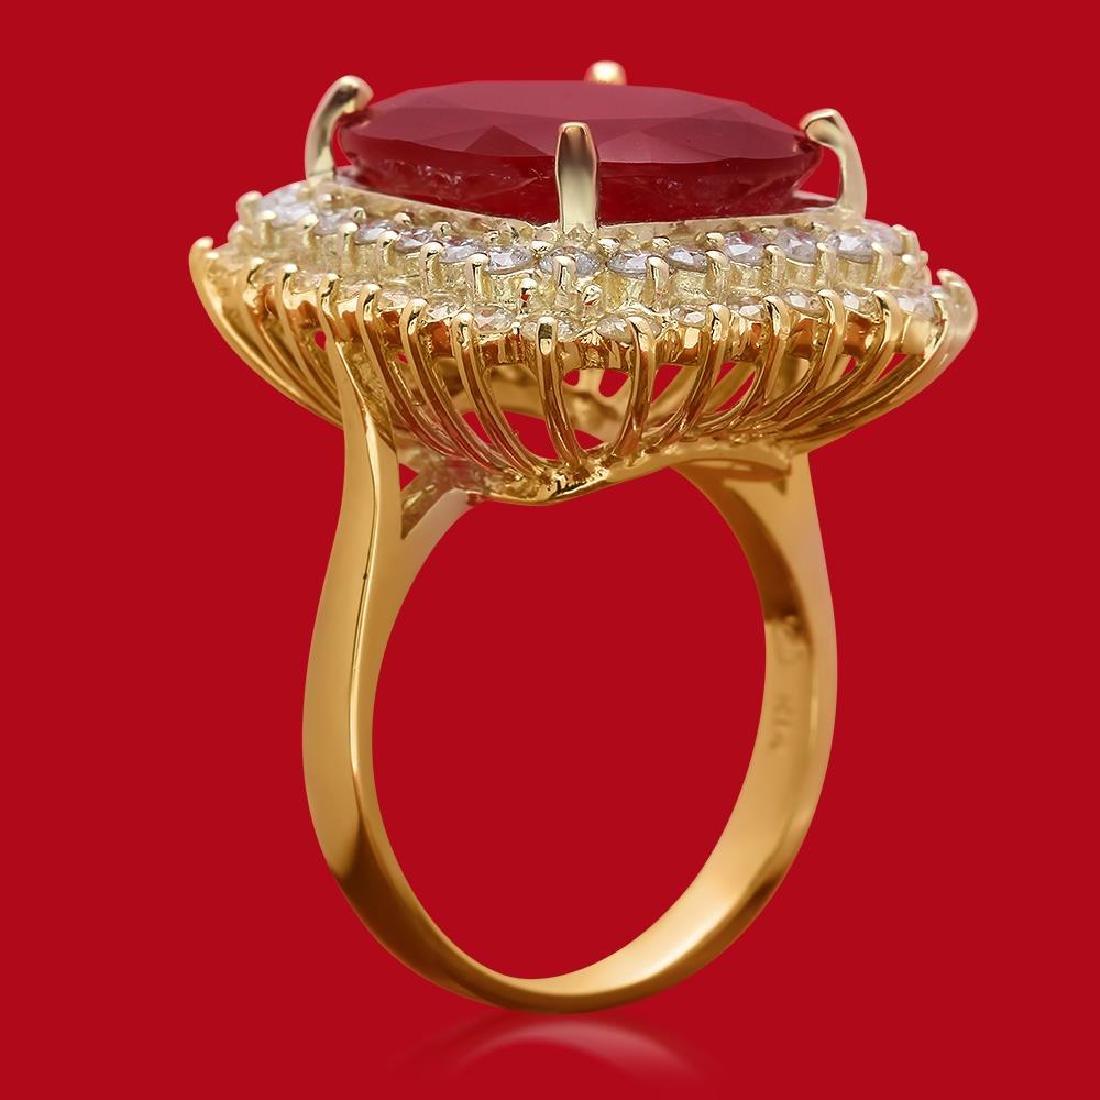 14K Gold 14.12ct Ruby 1.74ct Diamond Ring - 2